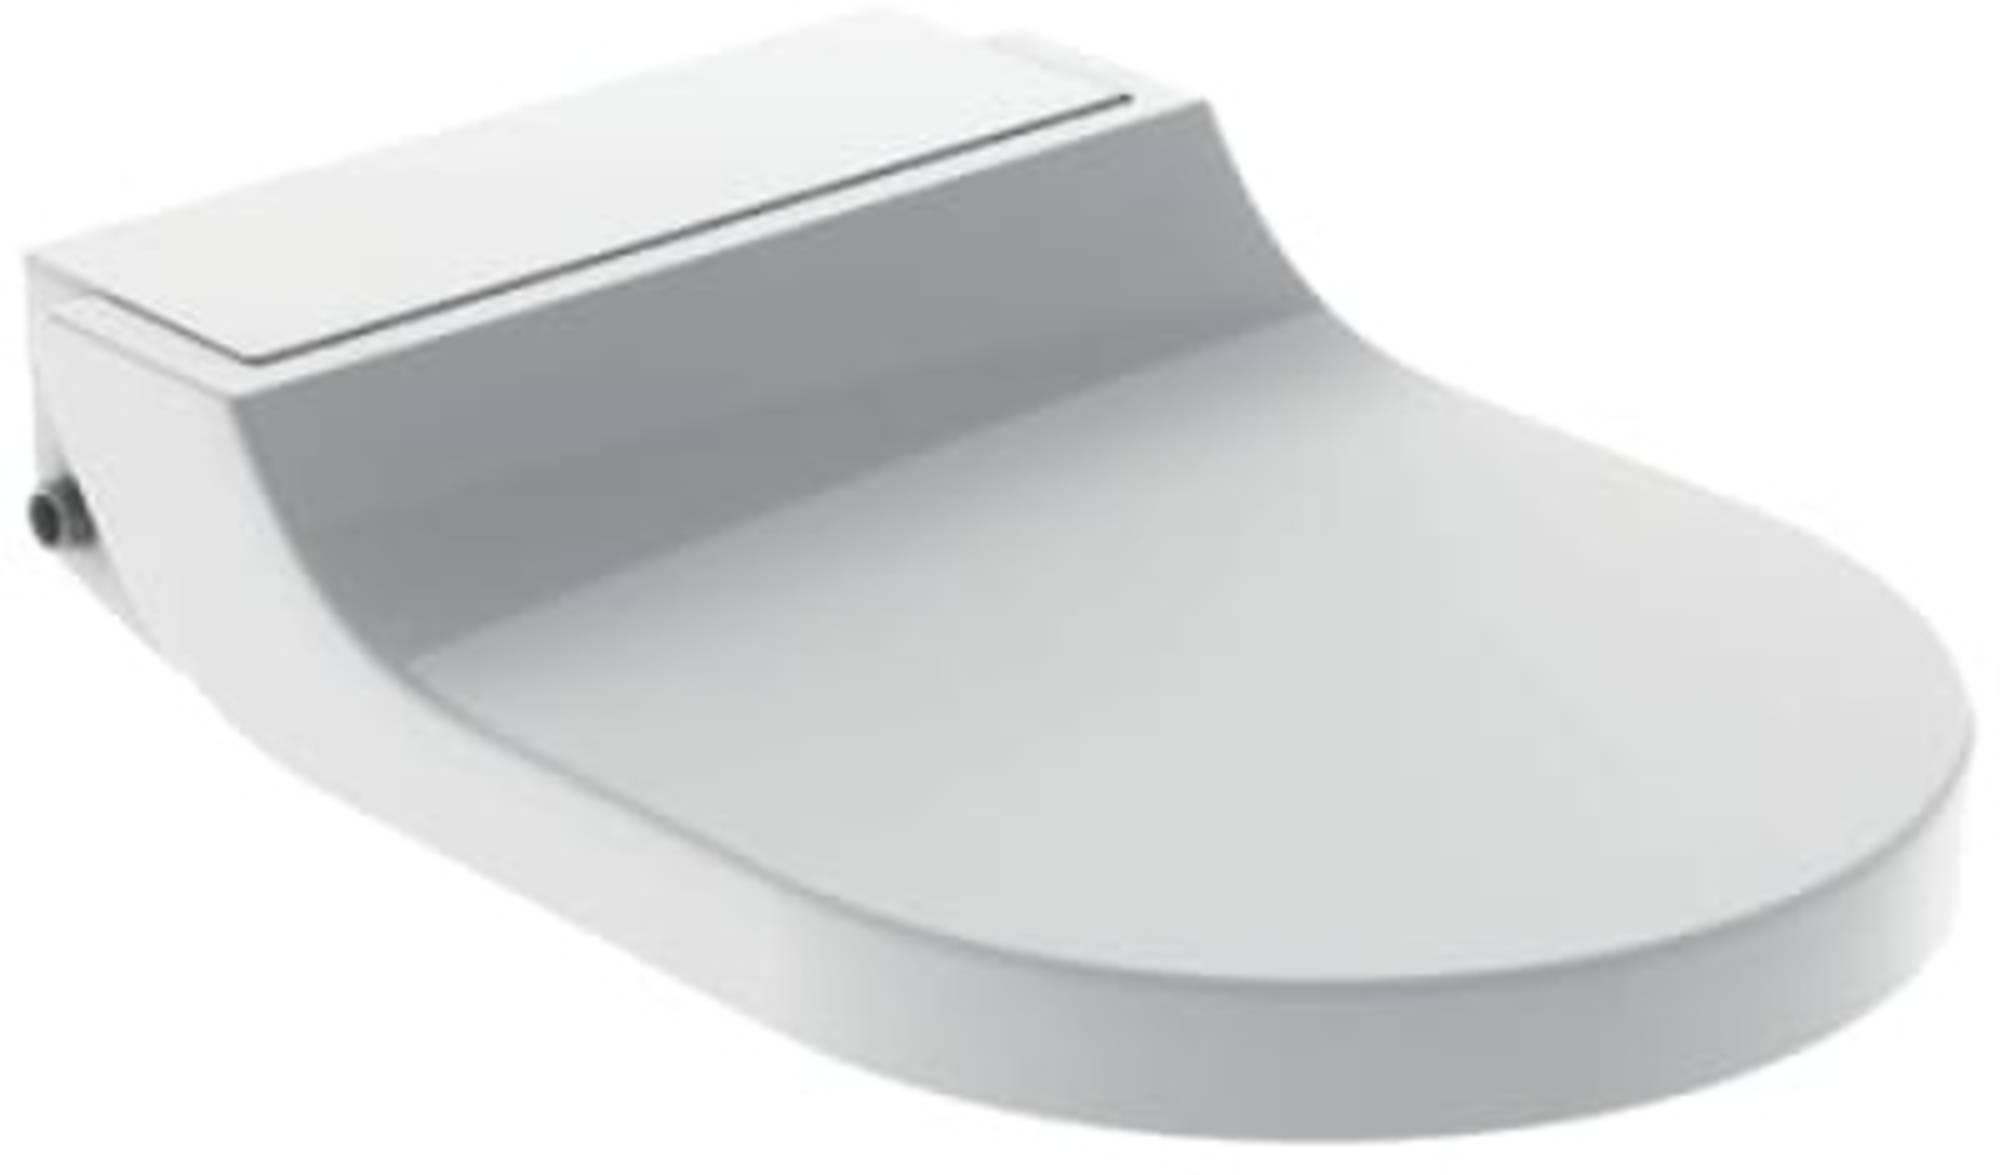 GEB closetzitt m-onderdouche AquaClean Tuma, kunstst, wit, bed